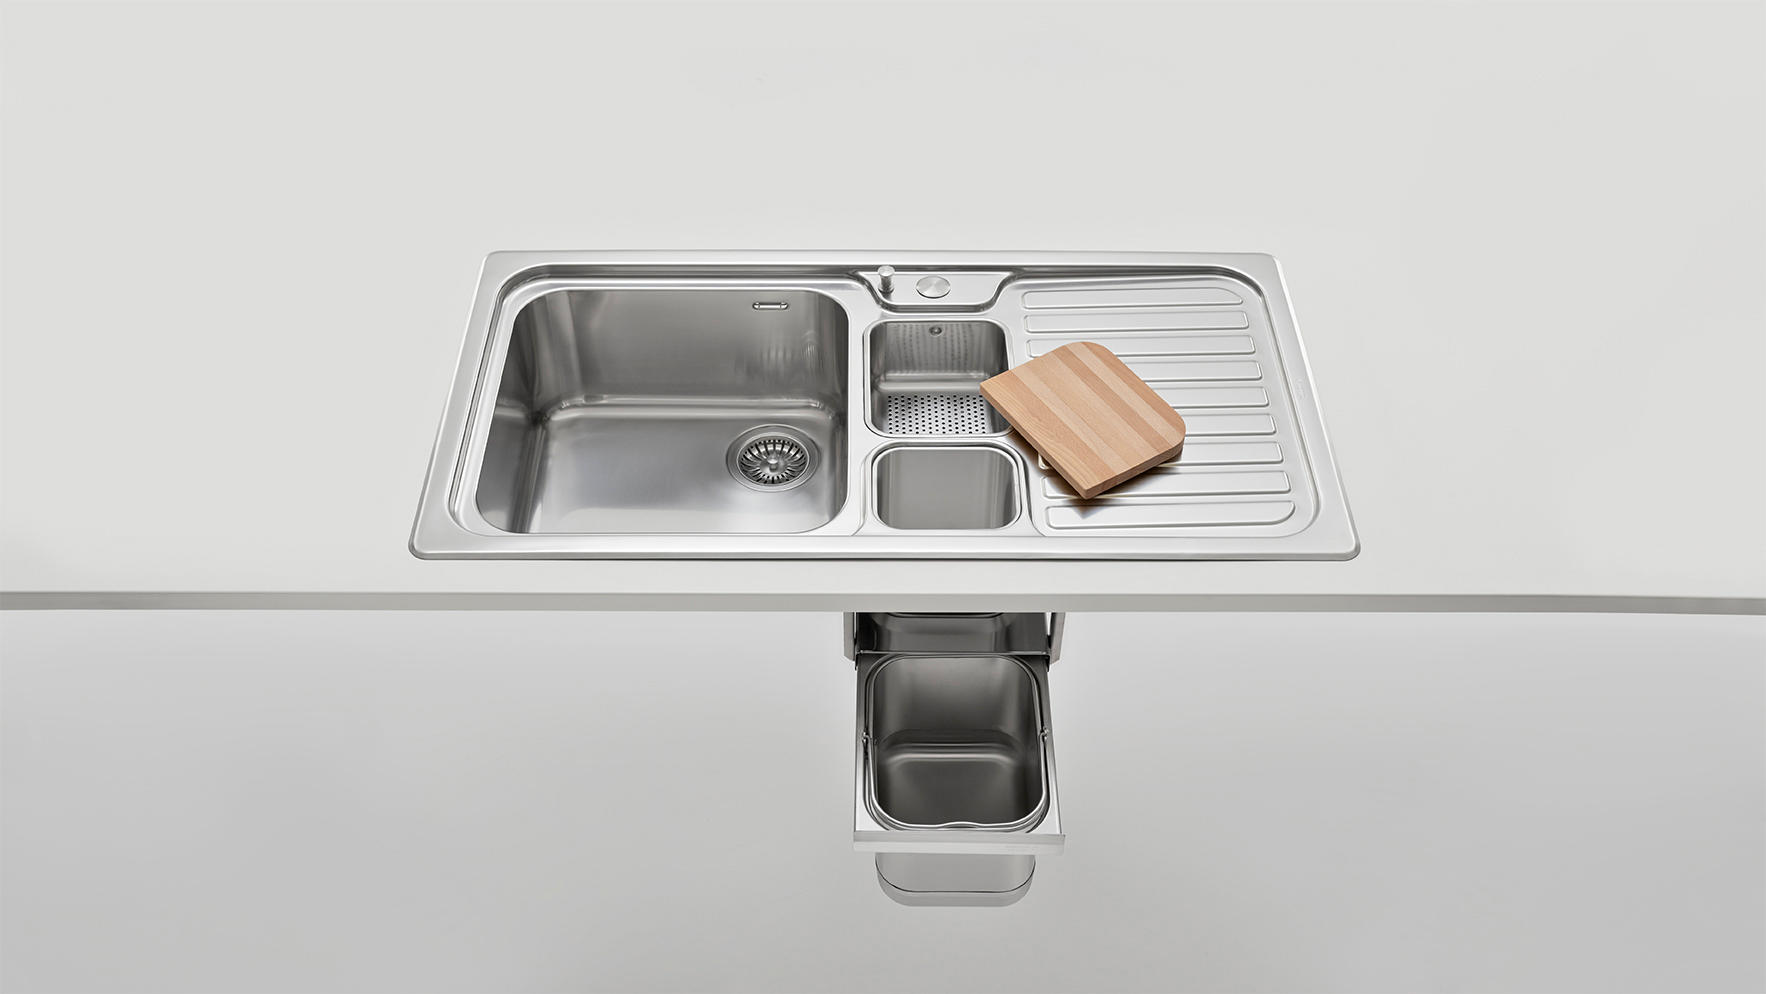 Inox Kitchen Sink : SINKS - Kitchen organization from ALPES-INOX Architonic